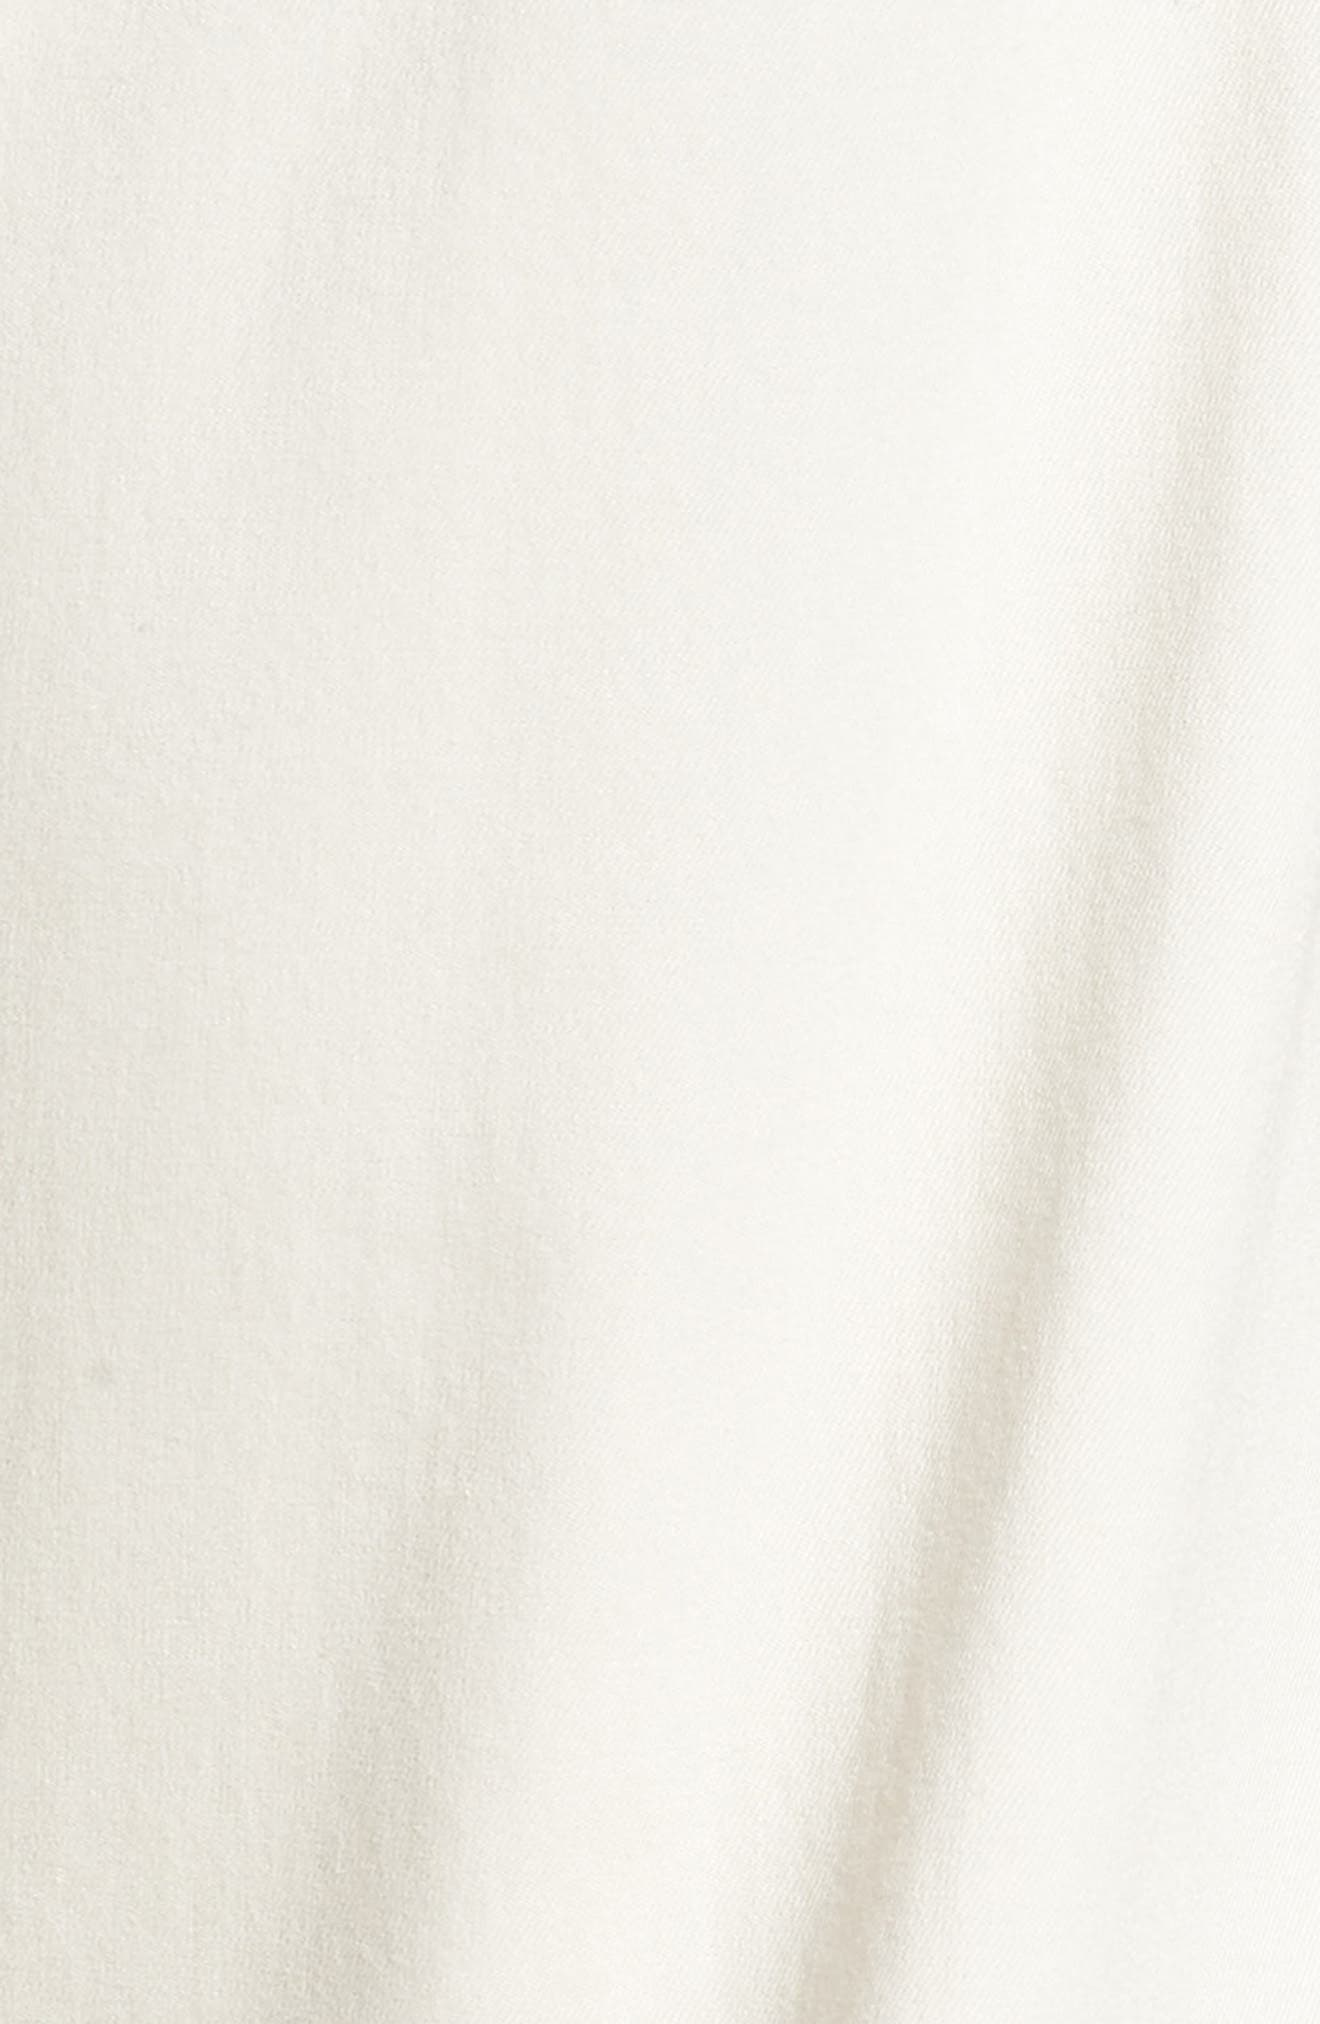 Dry Flex Slim Fit Golf Pants,                             Alternate thumbnail 5, color,                             LIGHT BONE/ WHITE